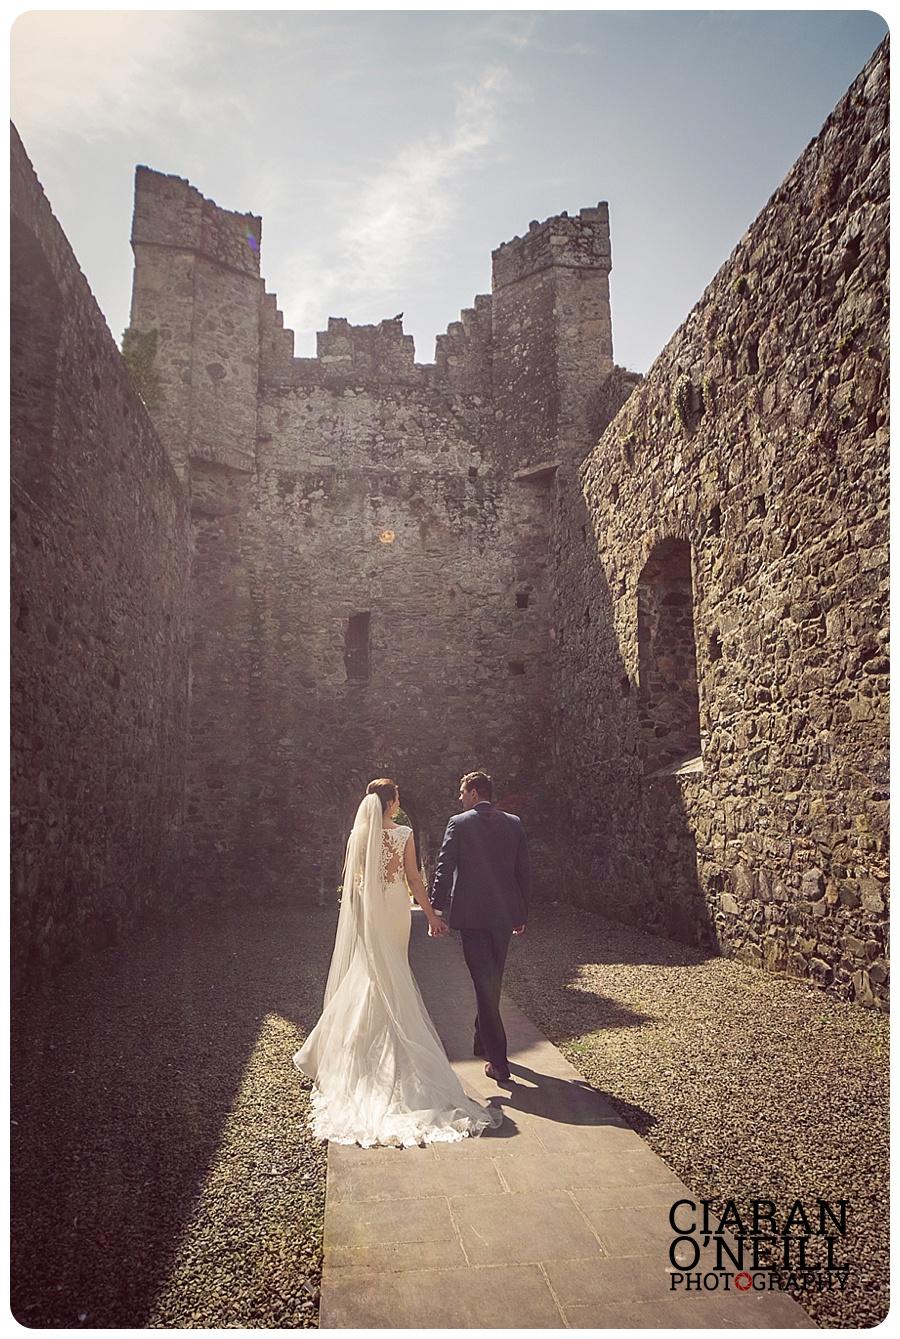 Ciara & Gerard's wedding at the Four Seasons Carlingford by Ciaran O'Neill Photography